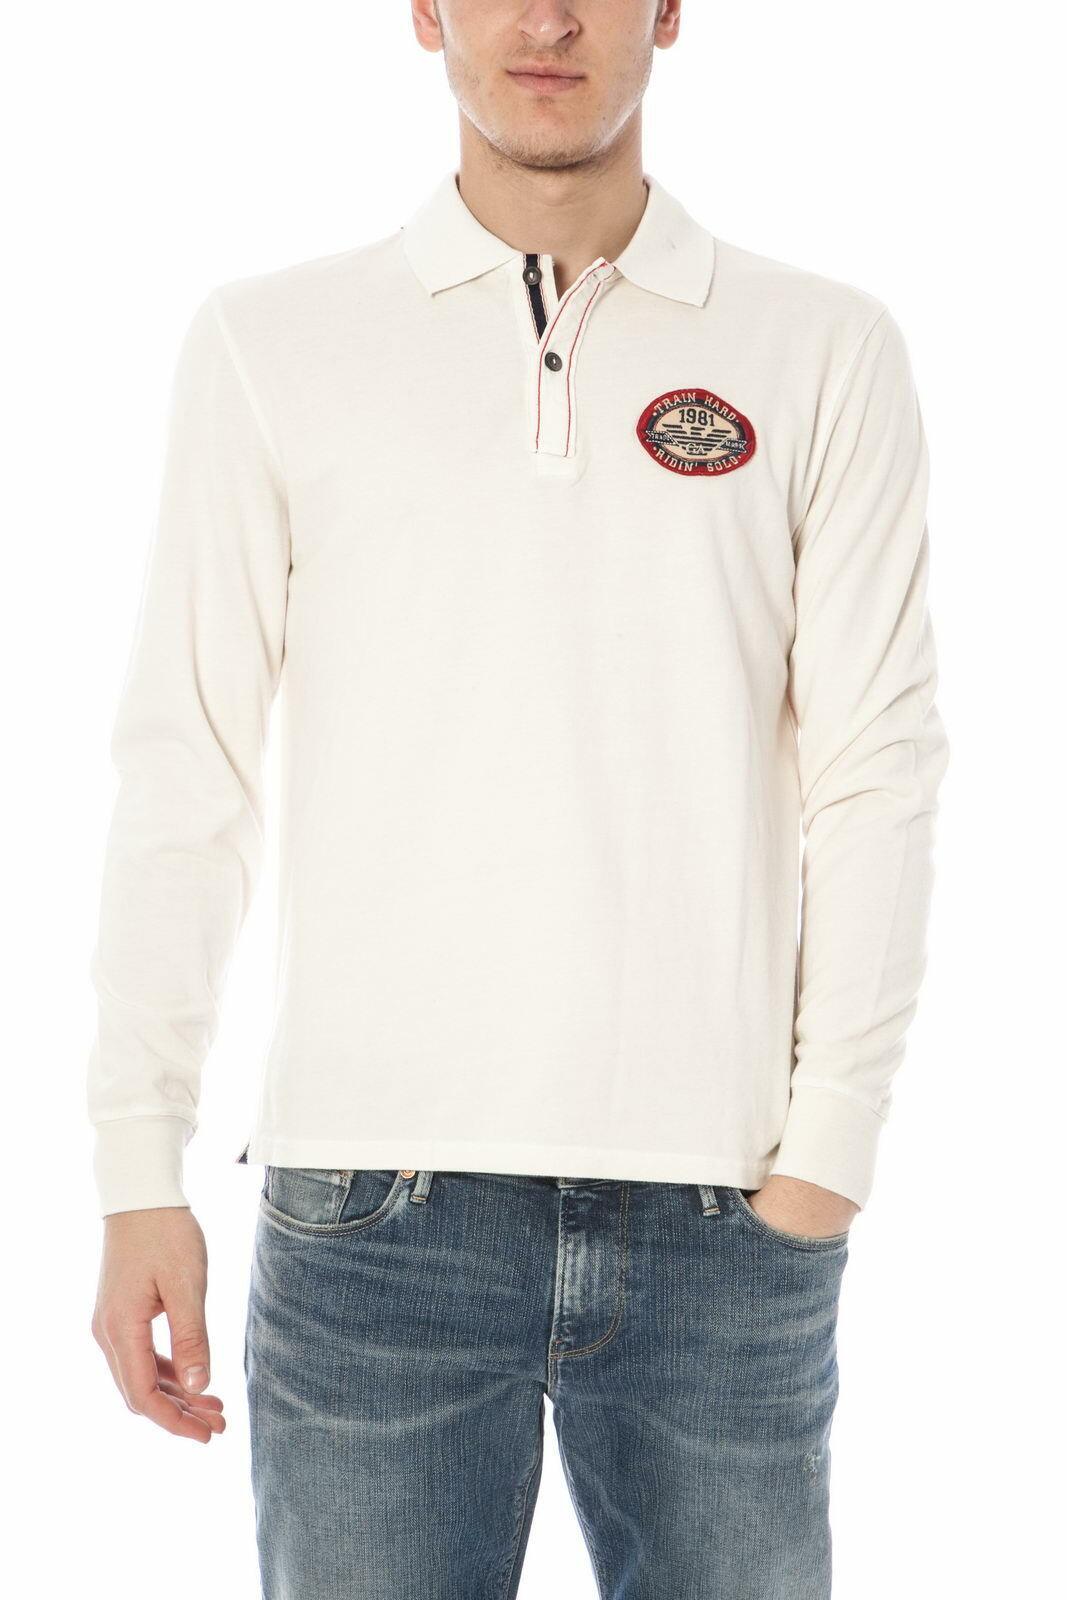 Polo Armani Jeans AJ Polo Shirt REGULAR FIT Cotone Uomo Bianco U6M08MG C1